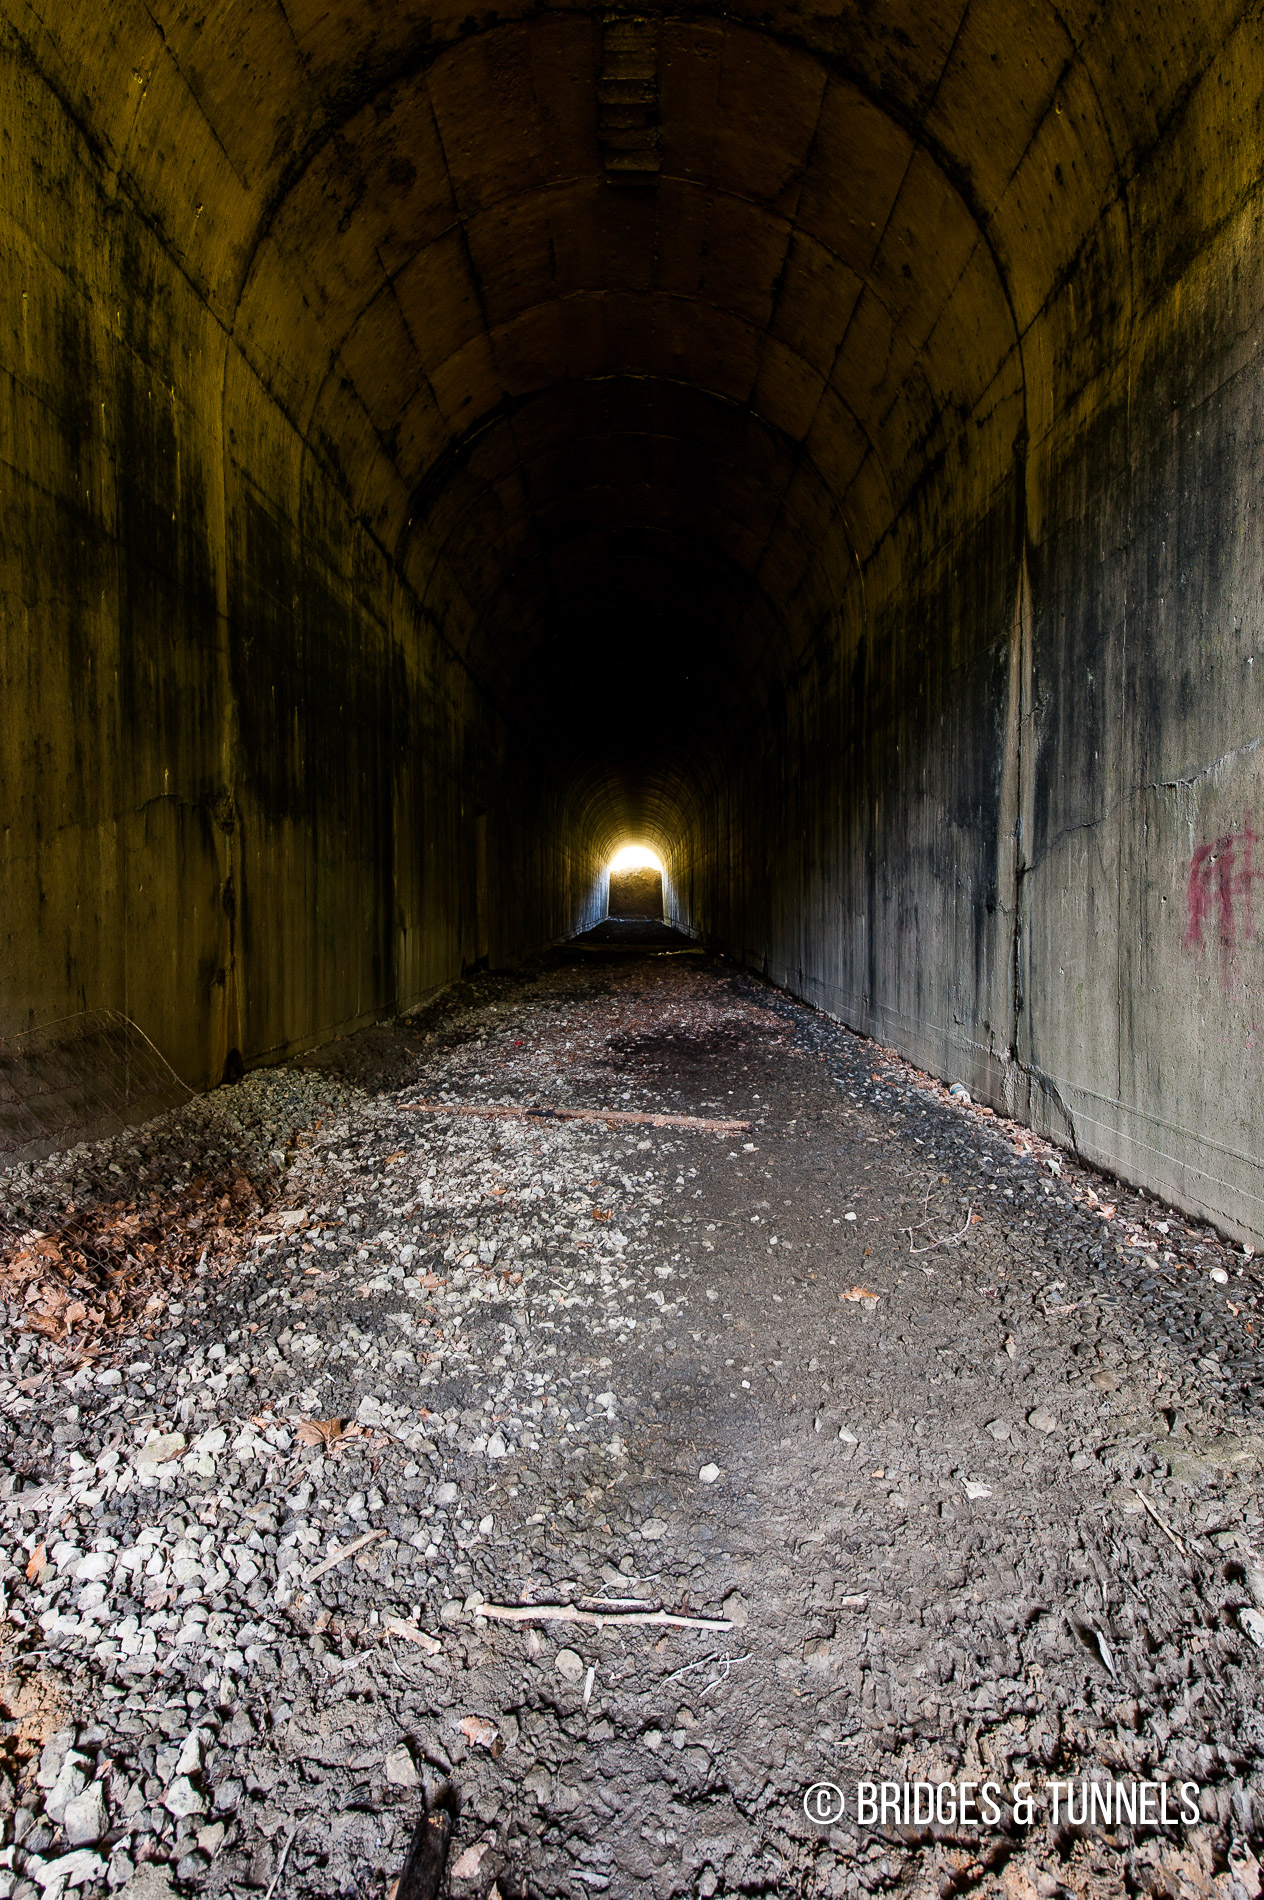 Aden Tunnel